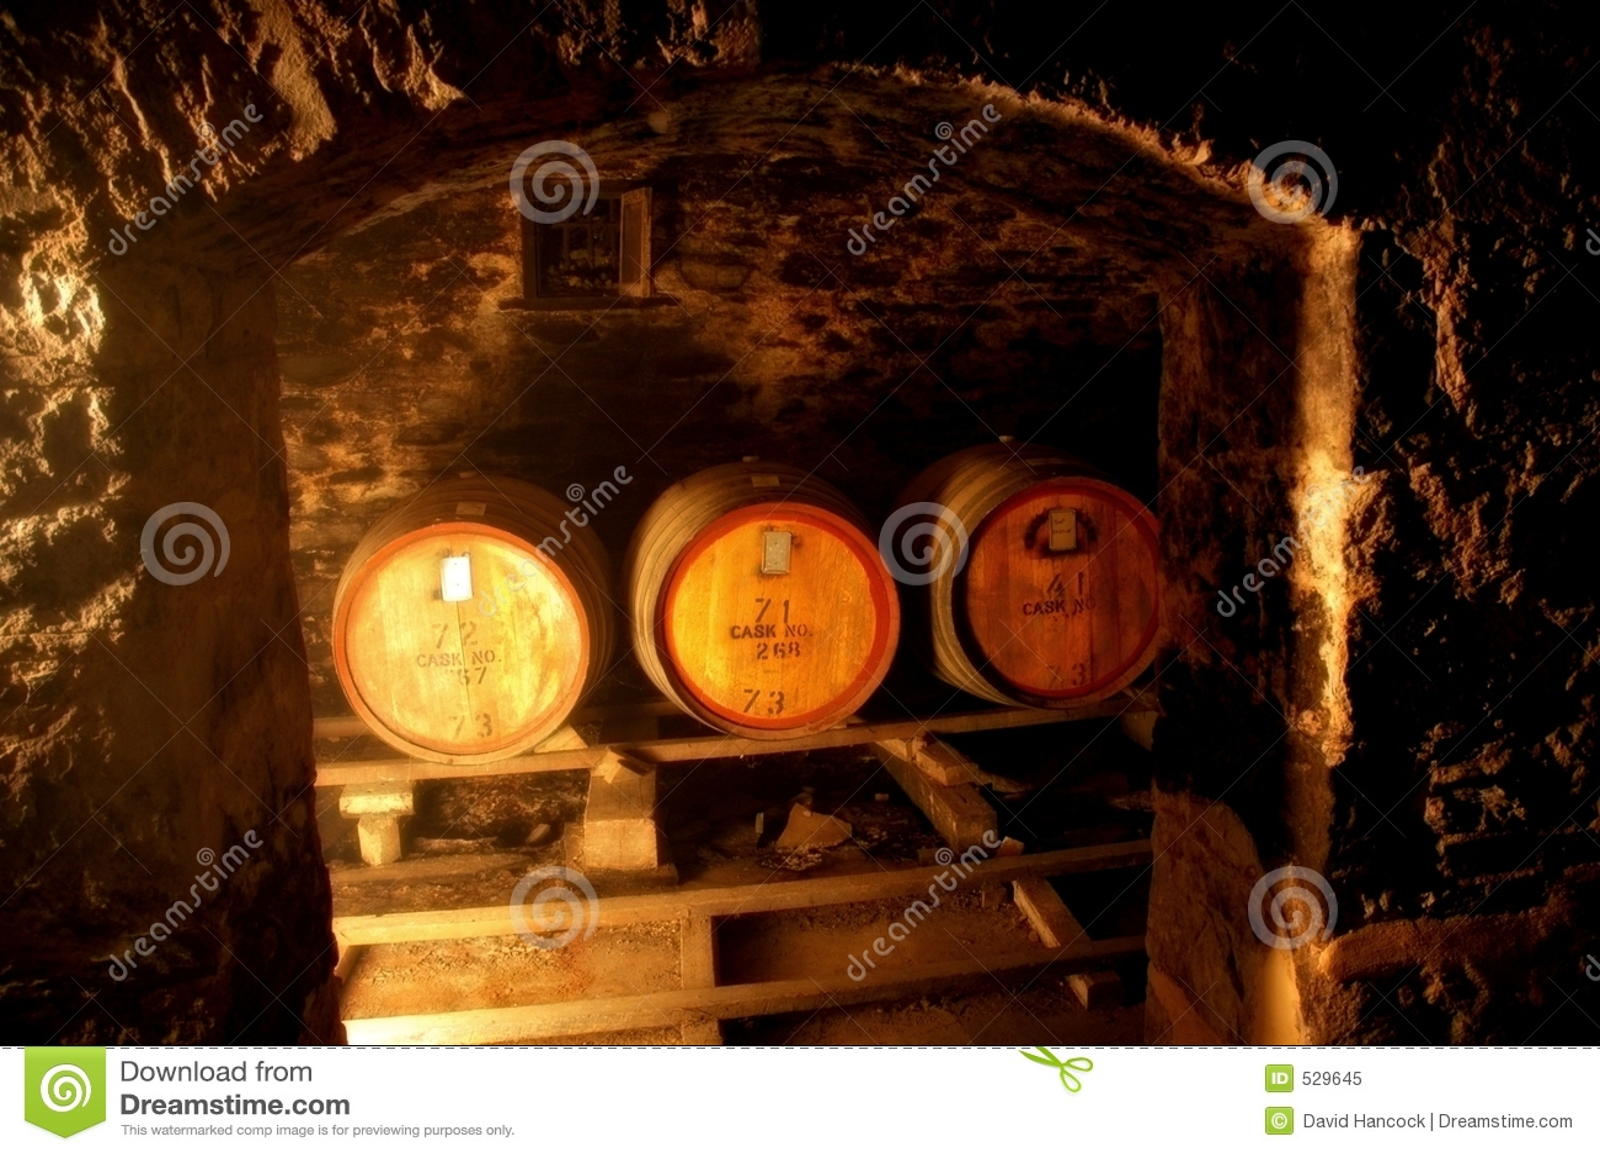 Download 地窖门 库存图片. 图片 包括有 bothy, 种植者, 地窖, 饮料, 地下, 楼层, 大桶, 制造商, 空白 - 529645